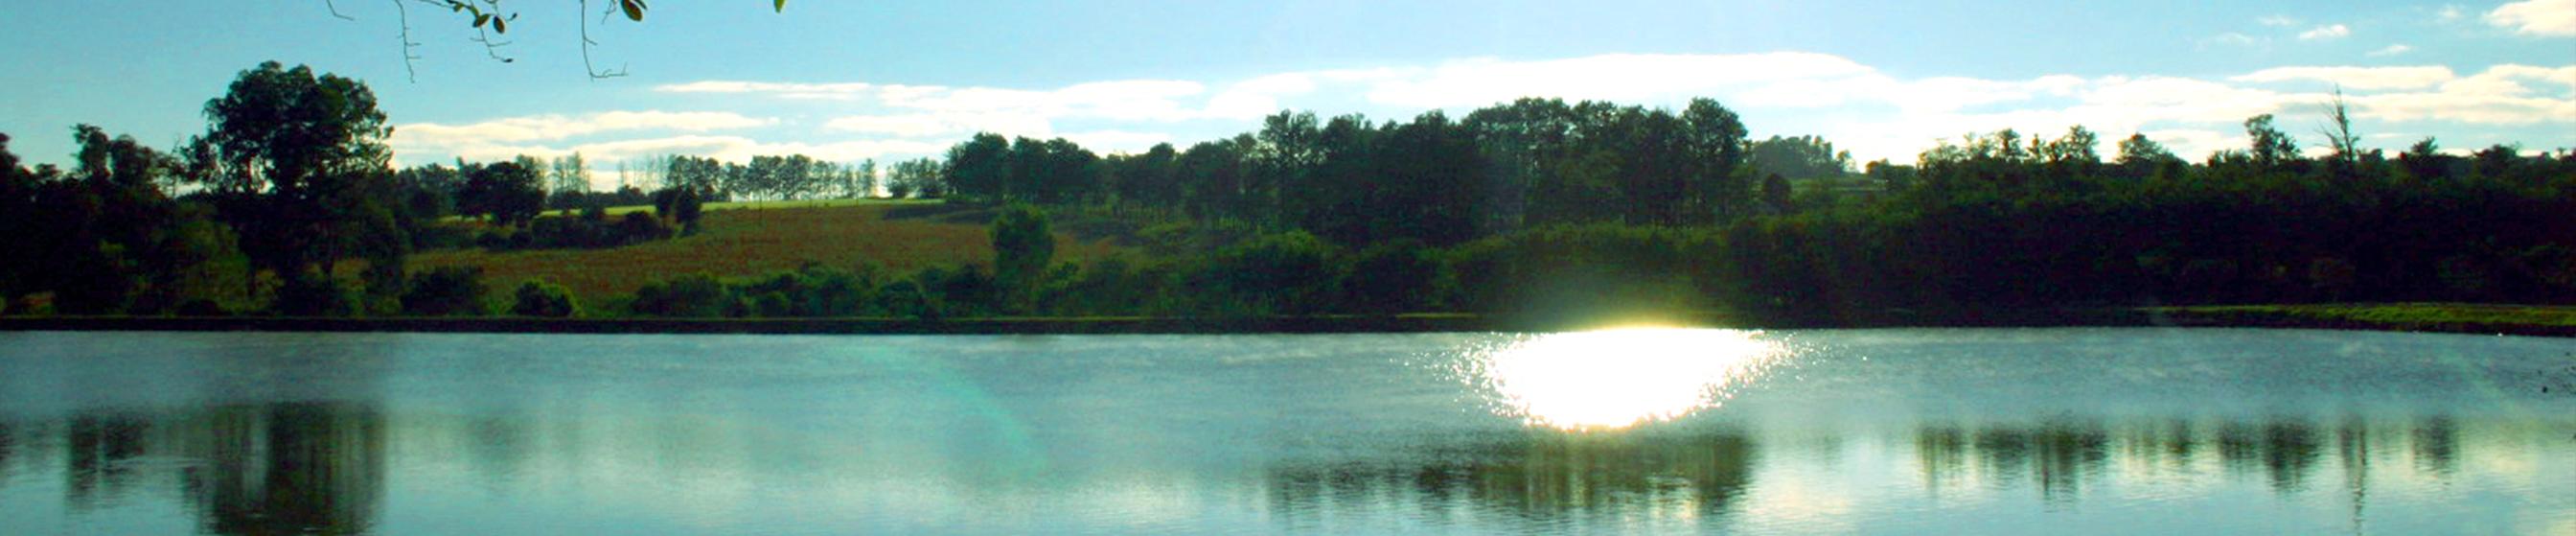 Lago no Horto Florestal